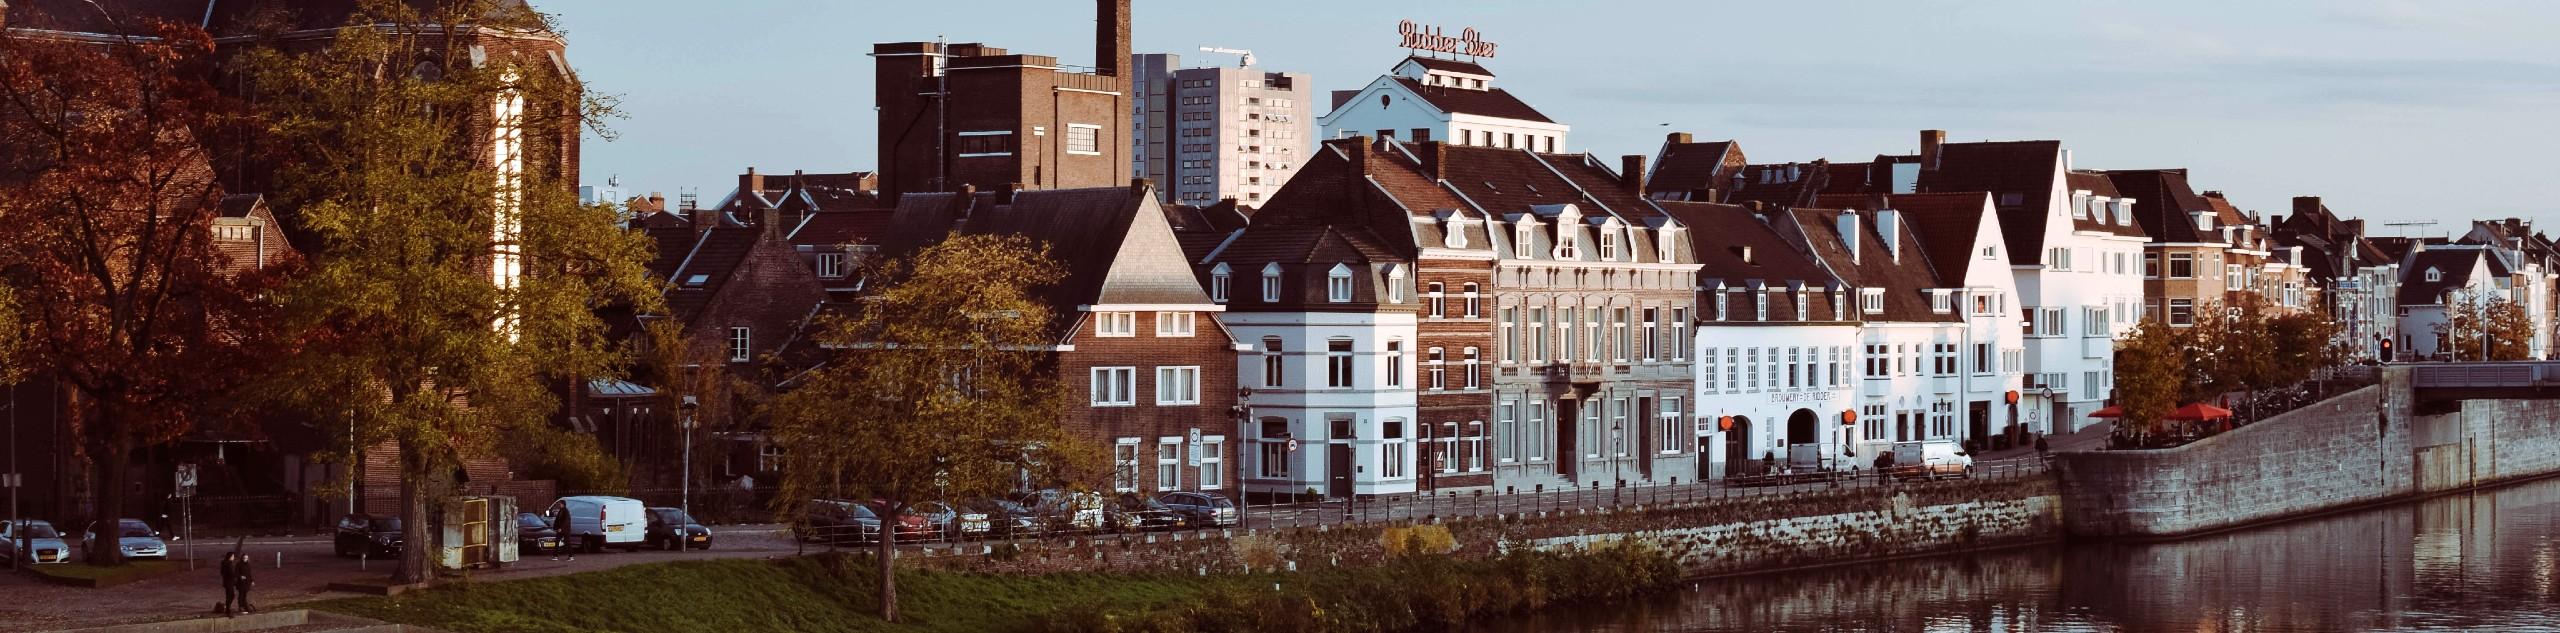 Houses in Limburg, Netherlands